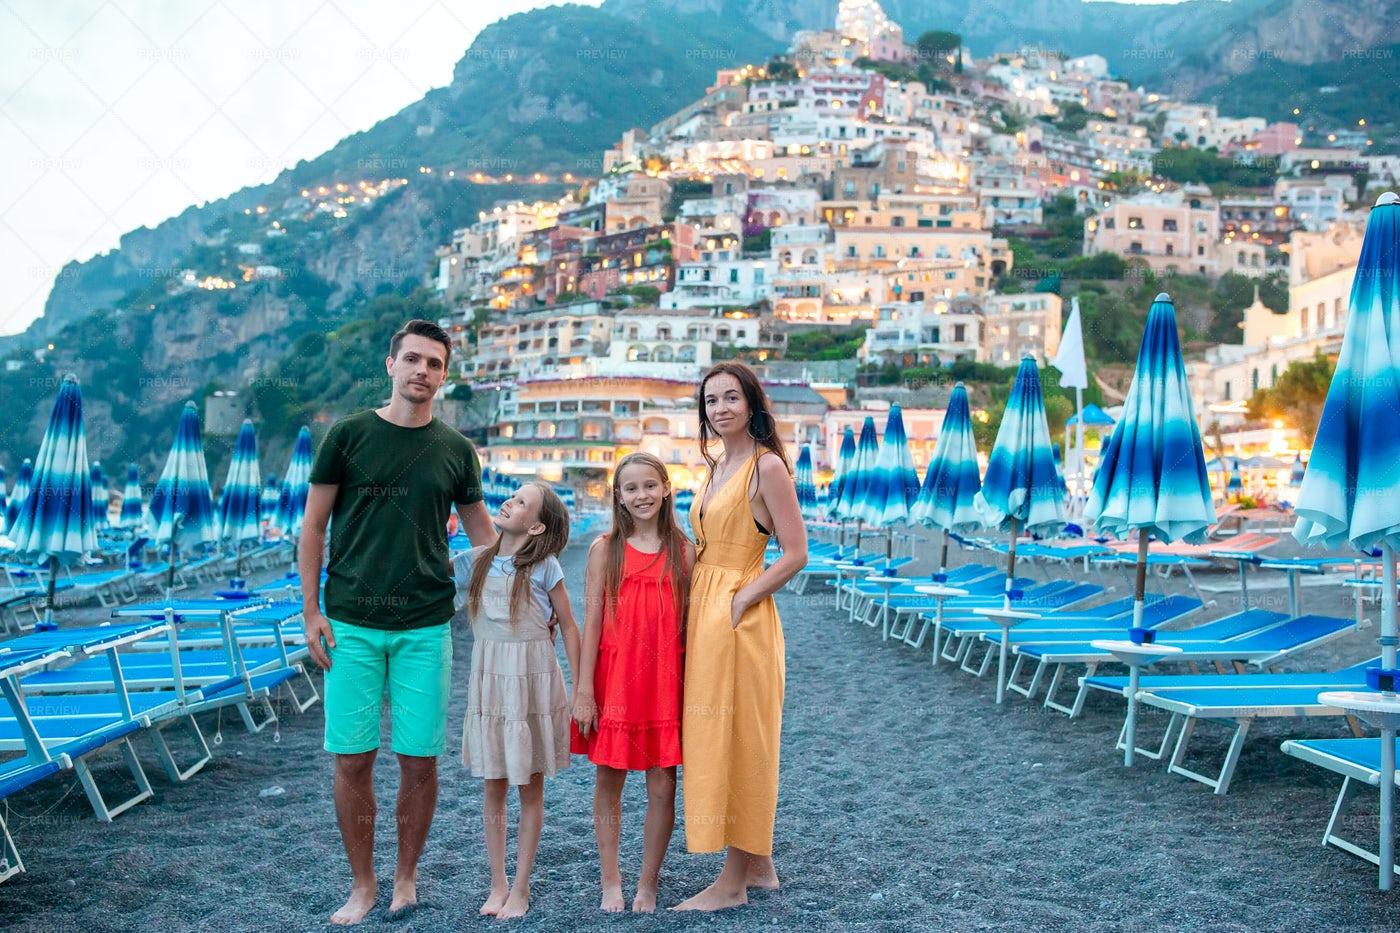 Family In Positano, Italy: Stock Photos